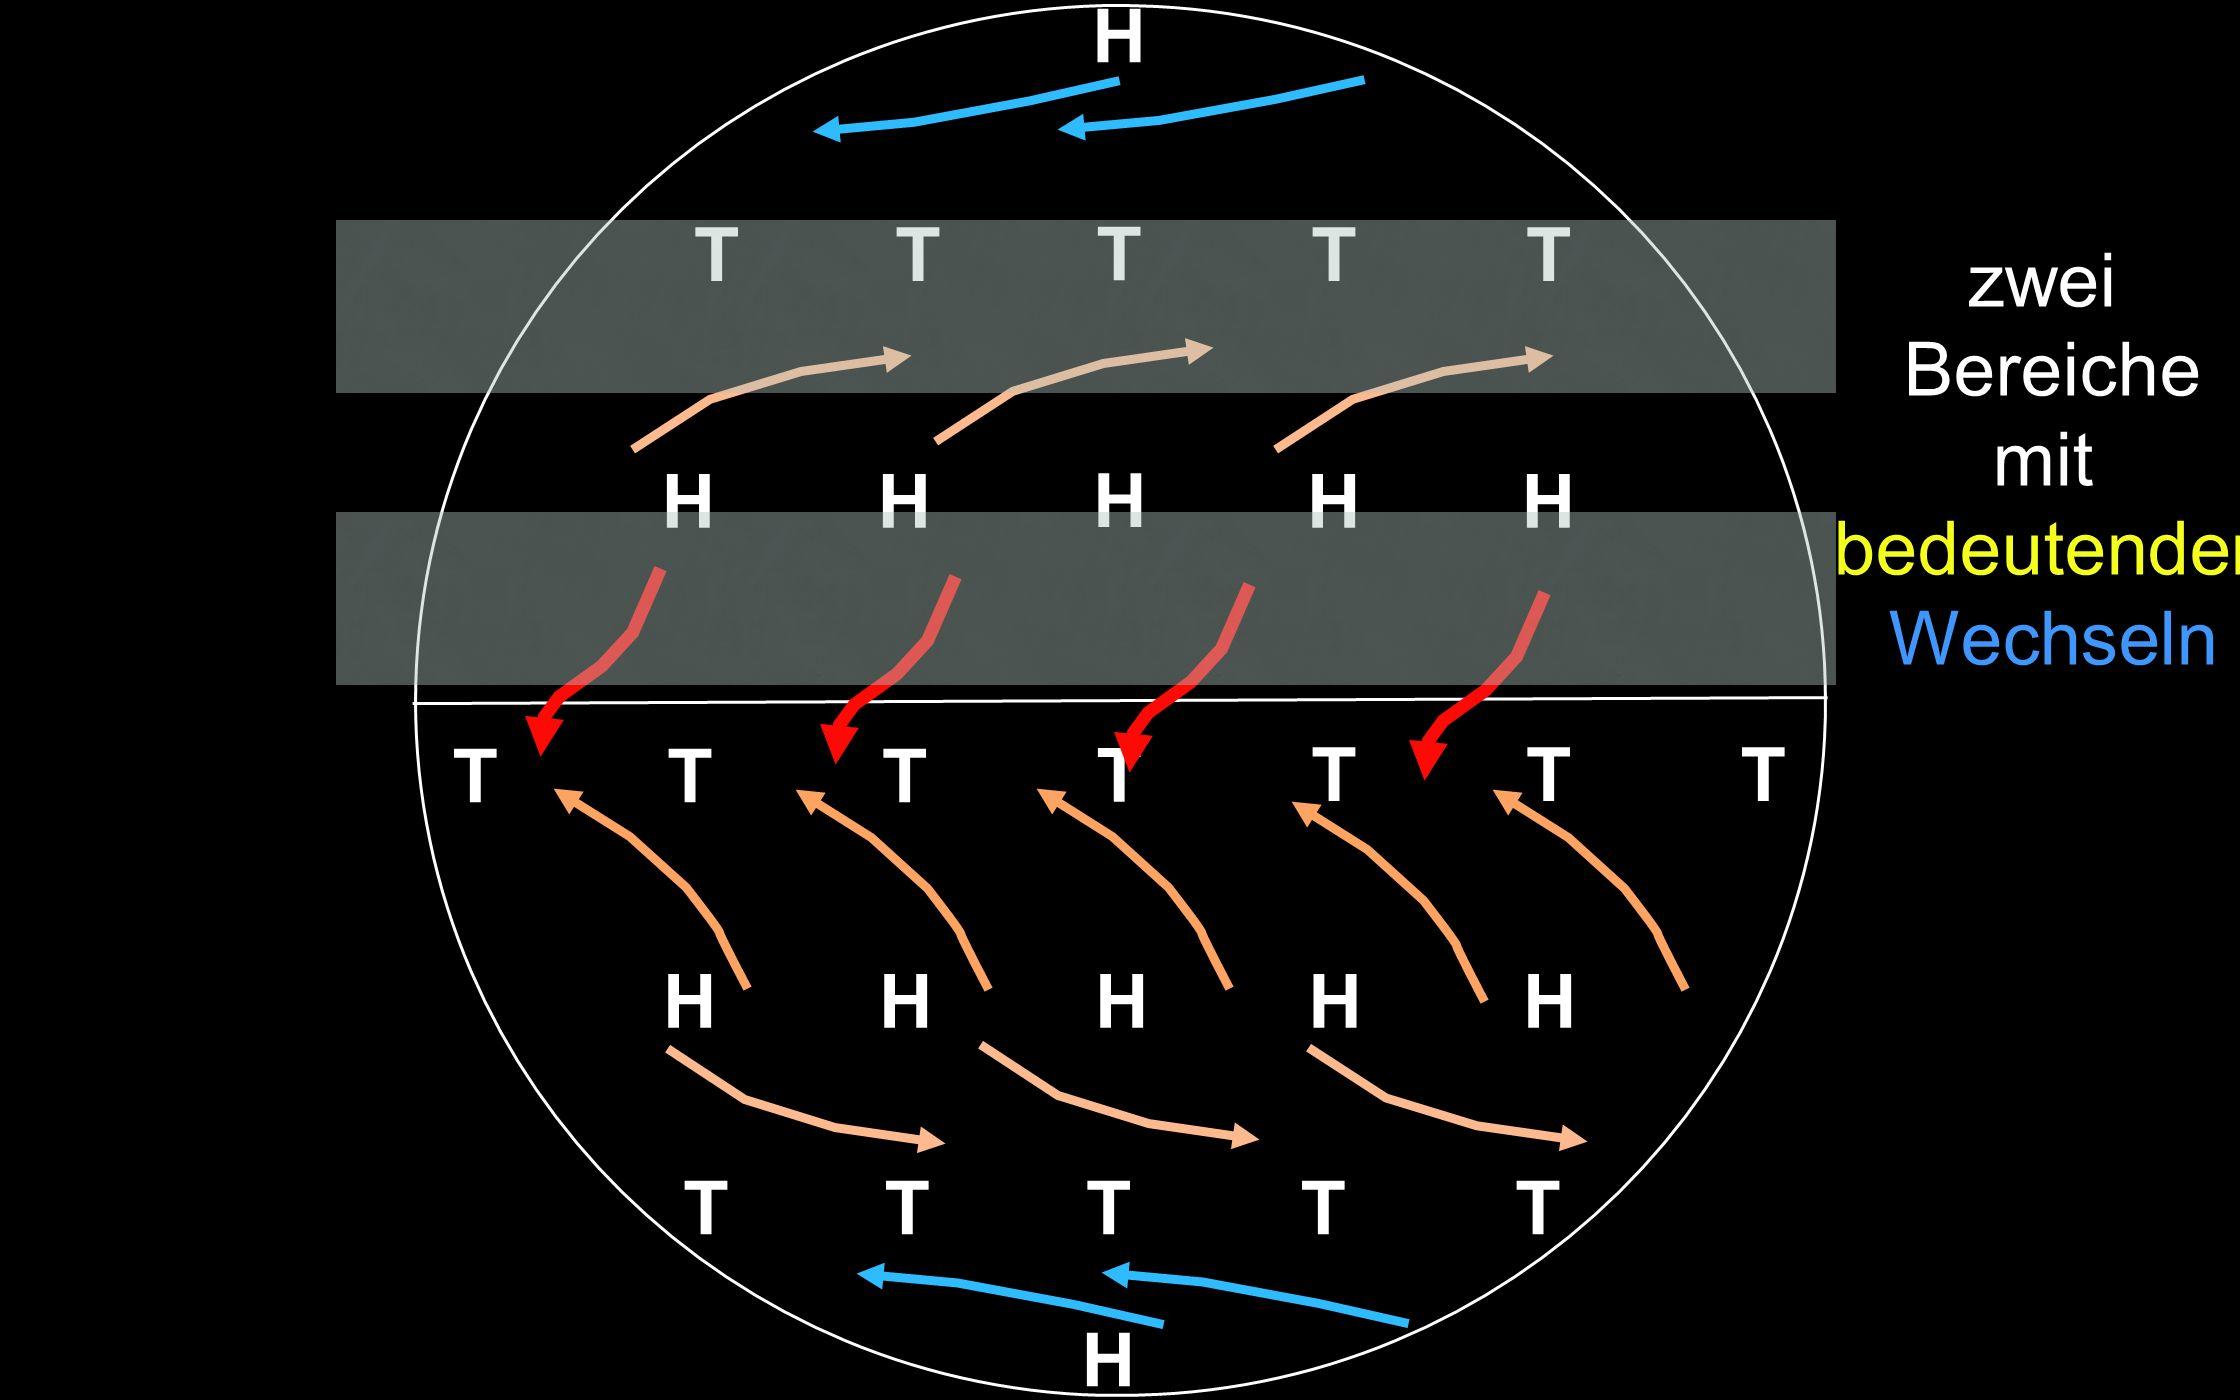 T TTT TTT H HHHH T TTTT H HHHHH TTTTT H zwei Bereiche mit bedeutenden Wechseln